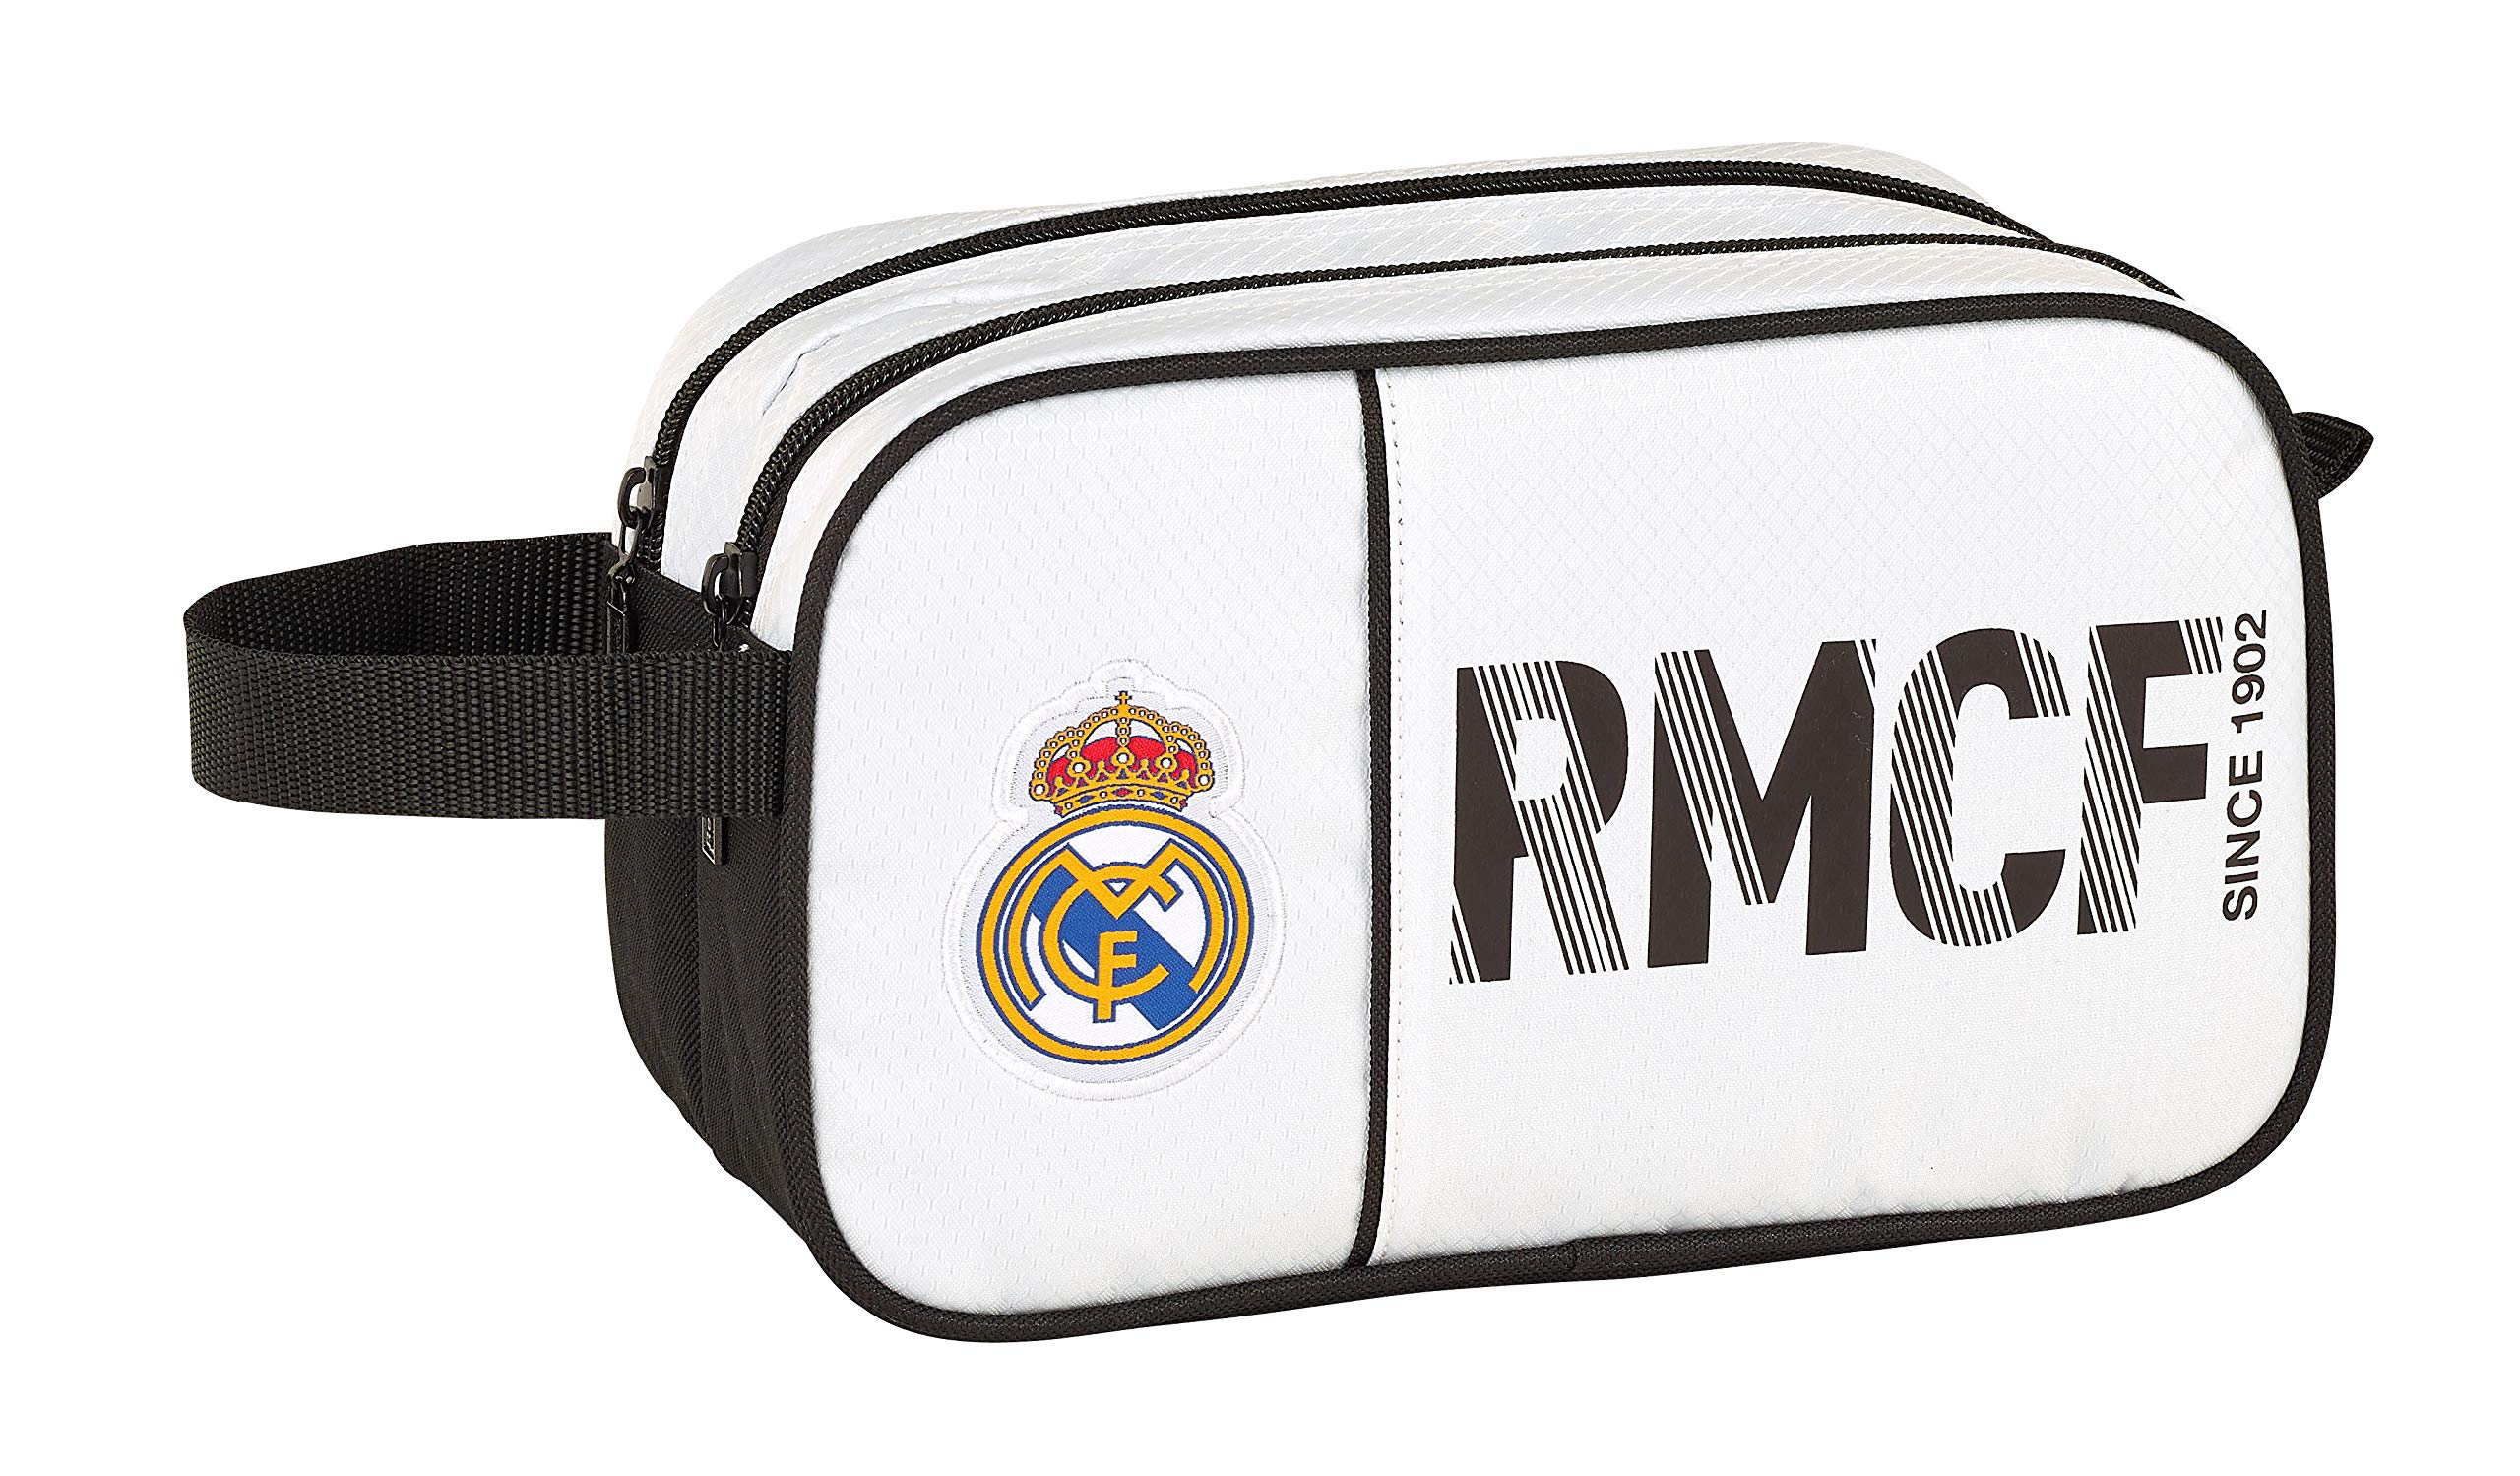 Real Madrid 811854518 2018 Bolsa de Aseo, 26 cm, Blanco